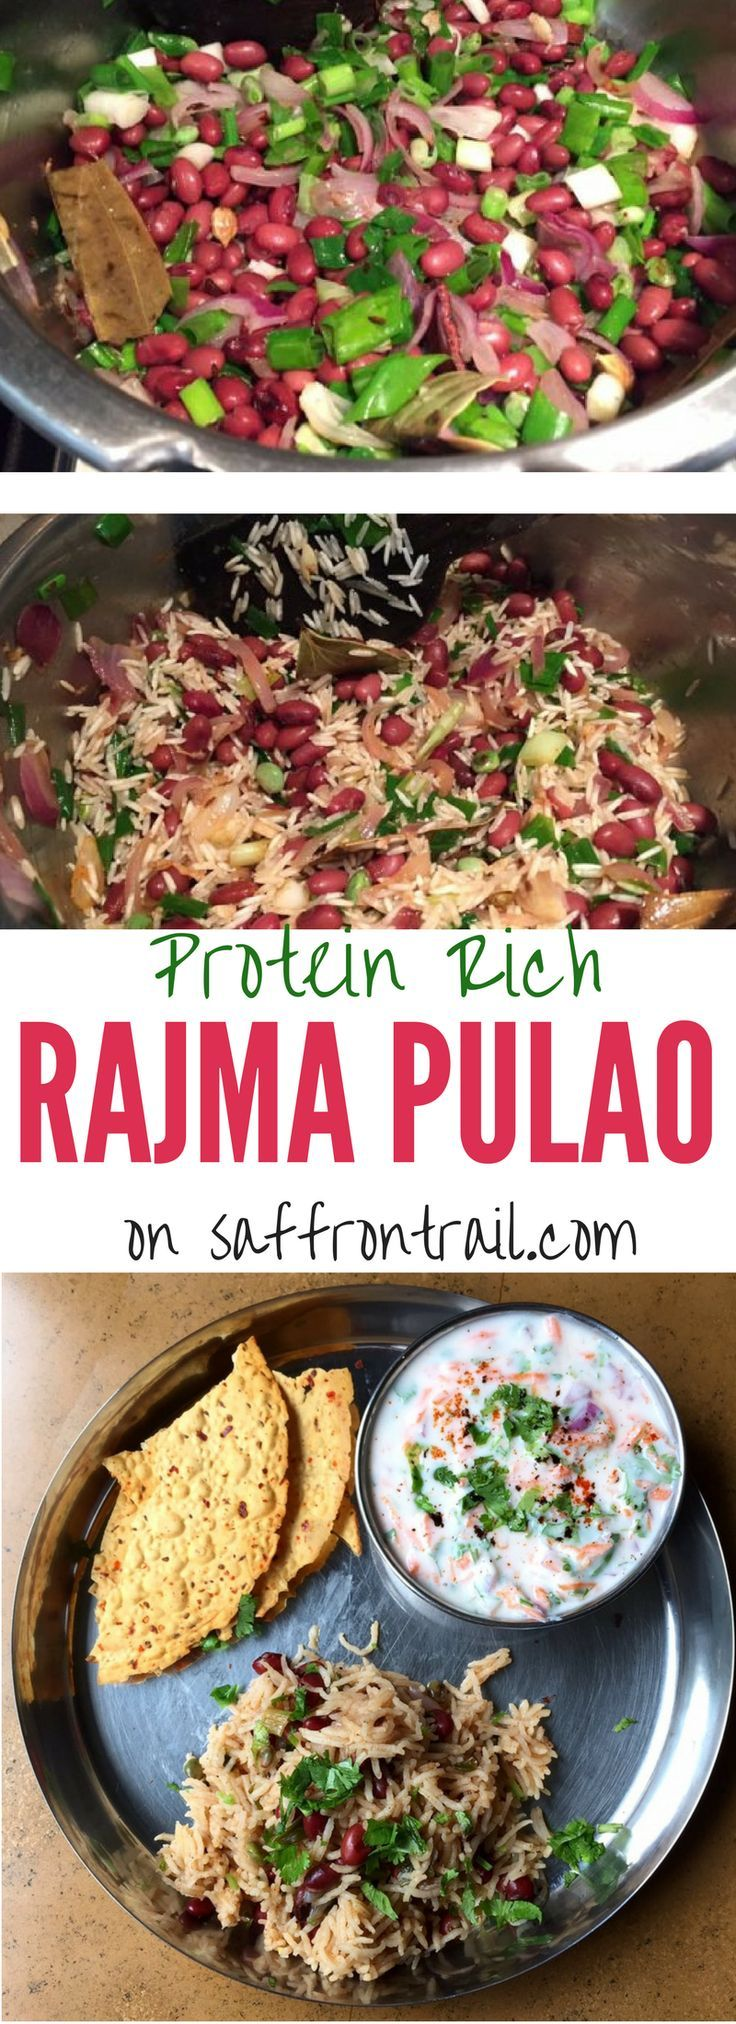 Rajma Pulao Recipe Vegetarian protein recipes, Recipes